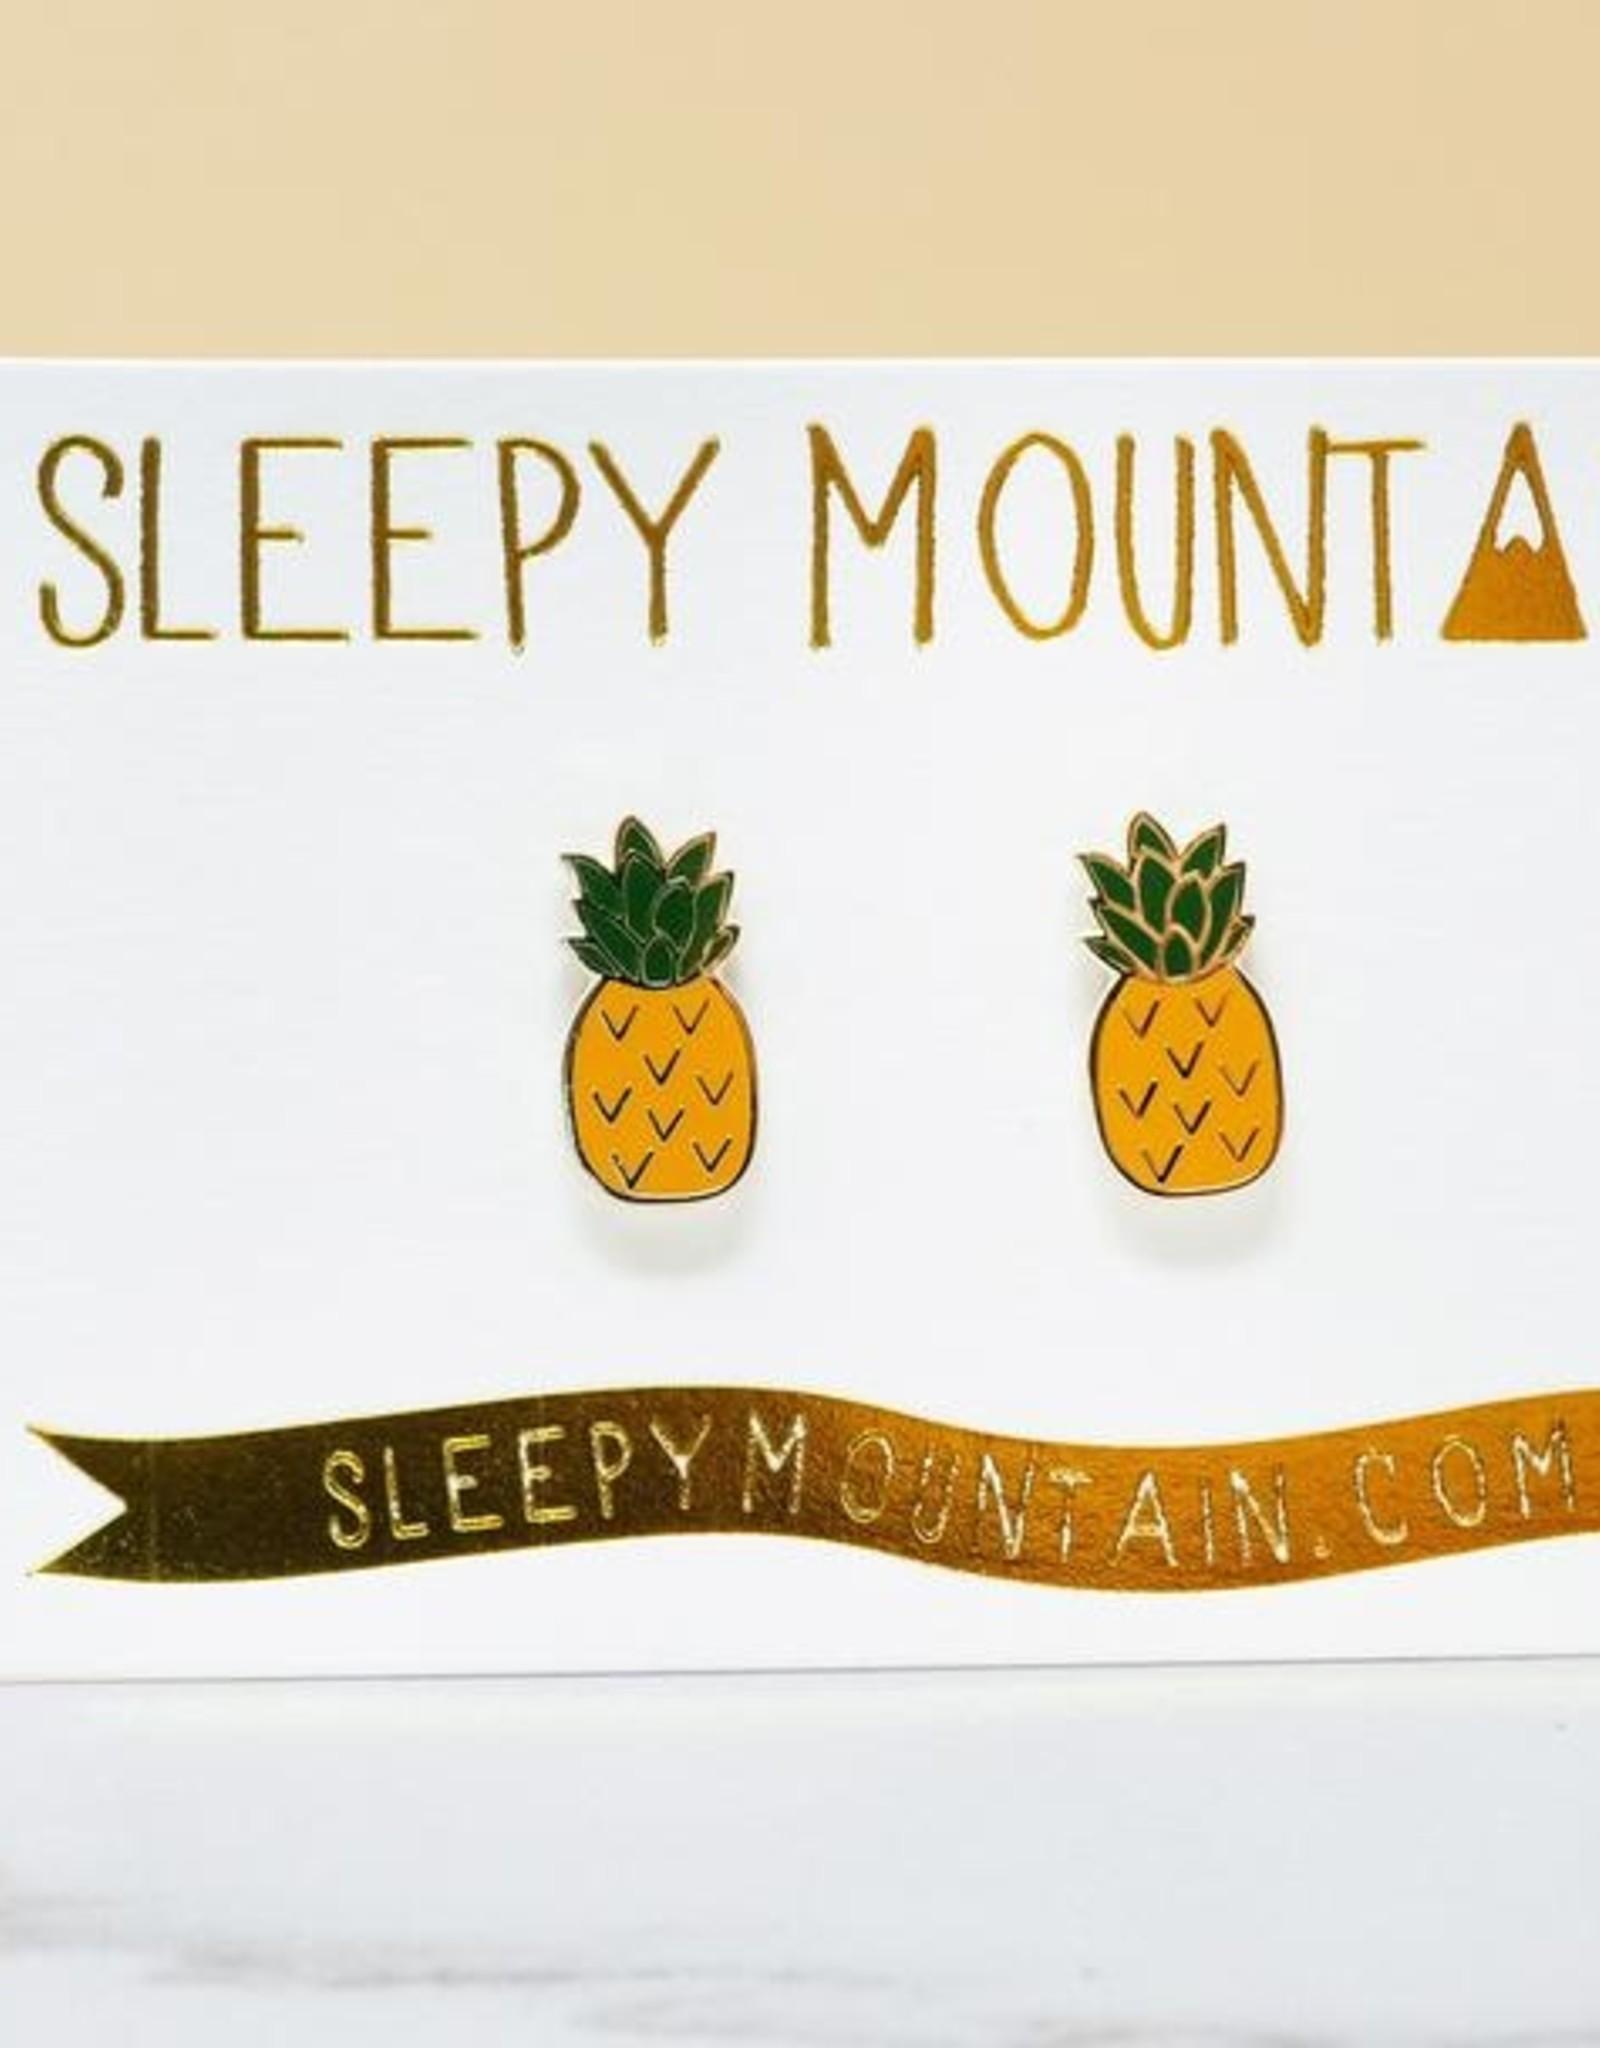 Sleepy Mountain Gold Plated Stud Earrings by Sleepy Mountain